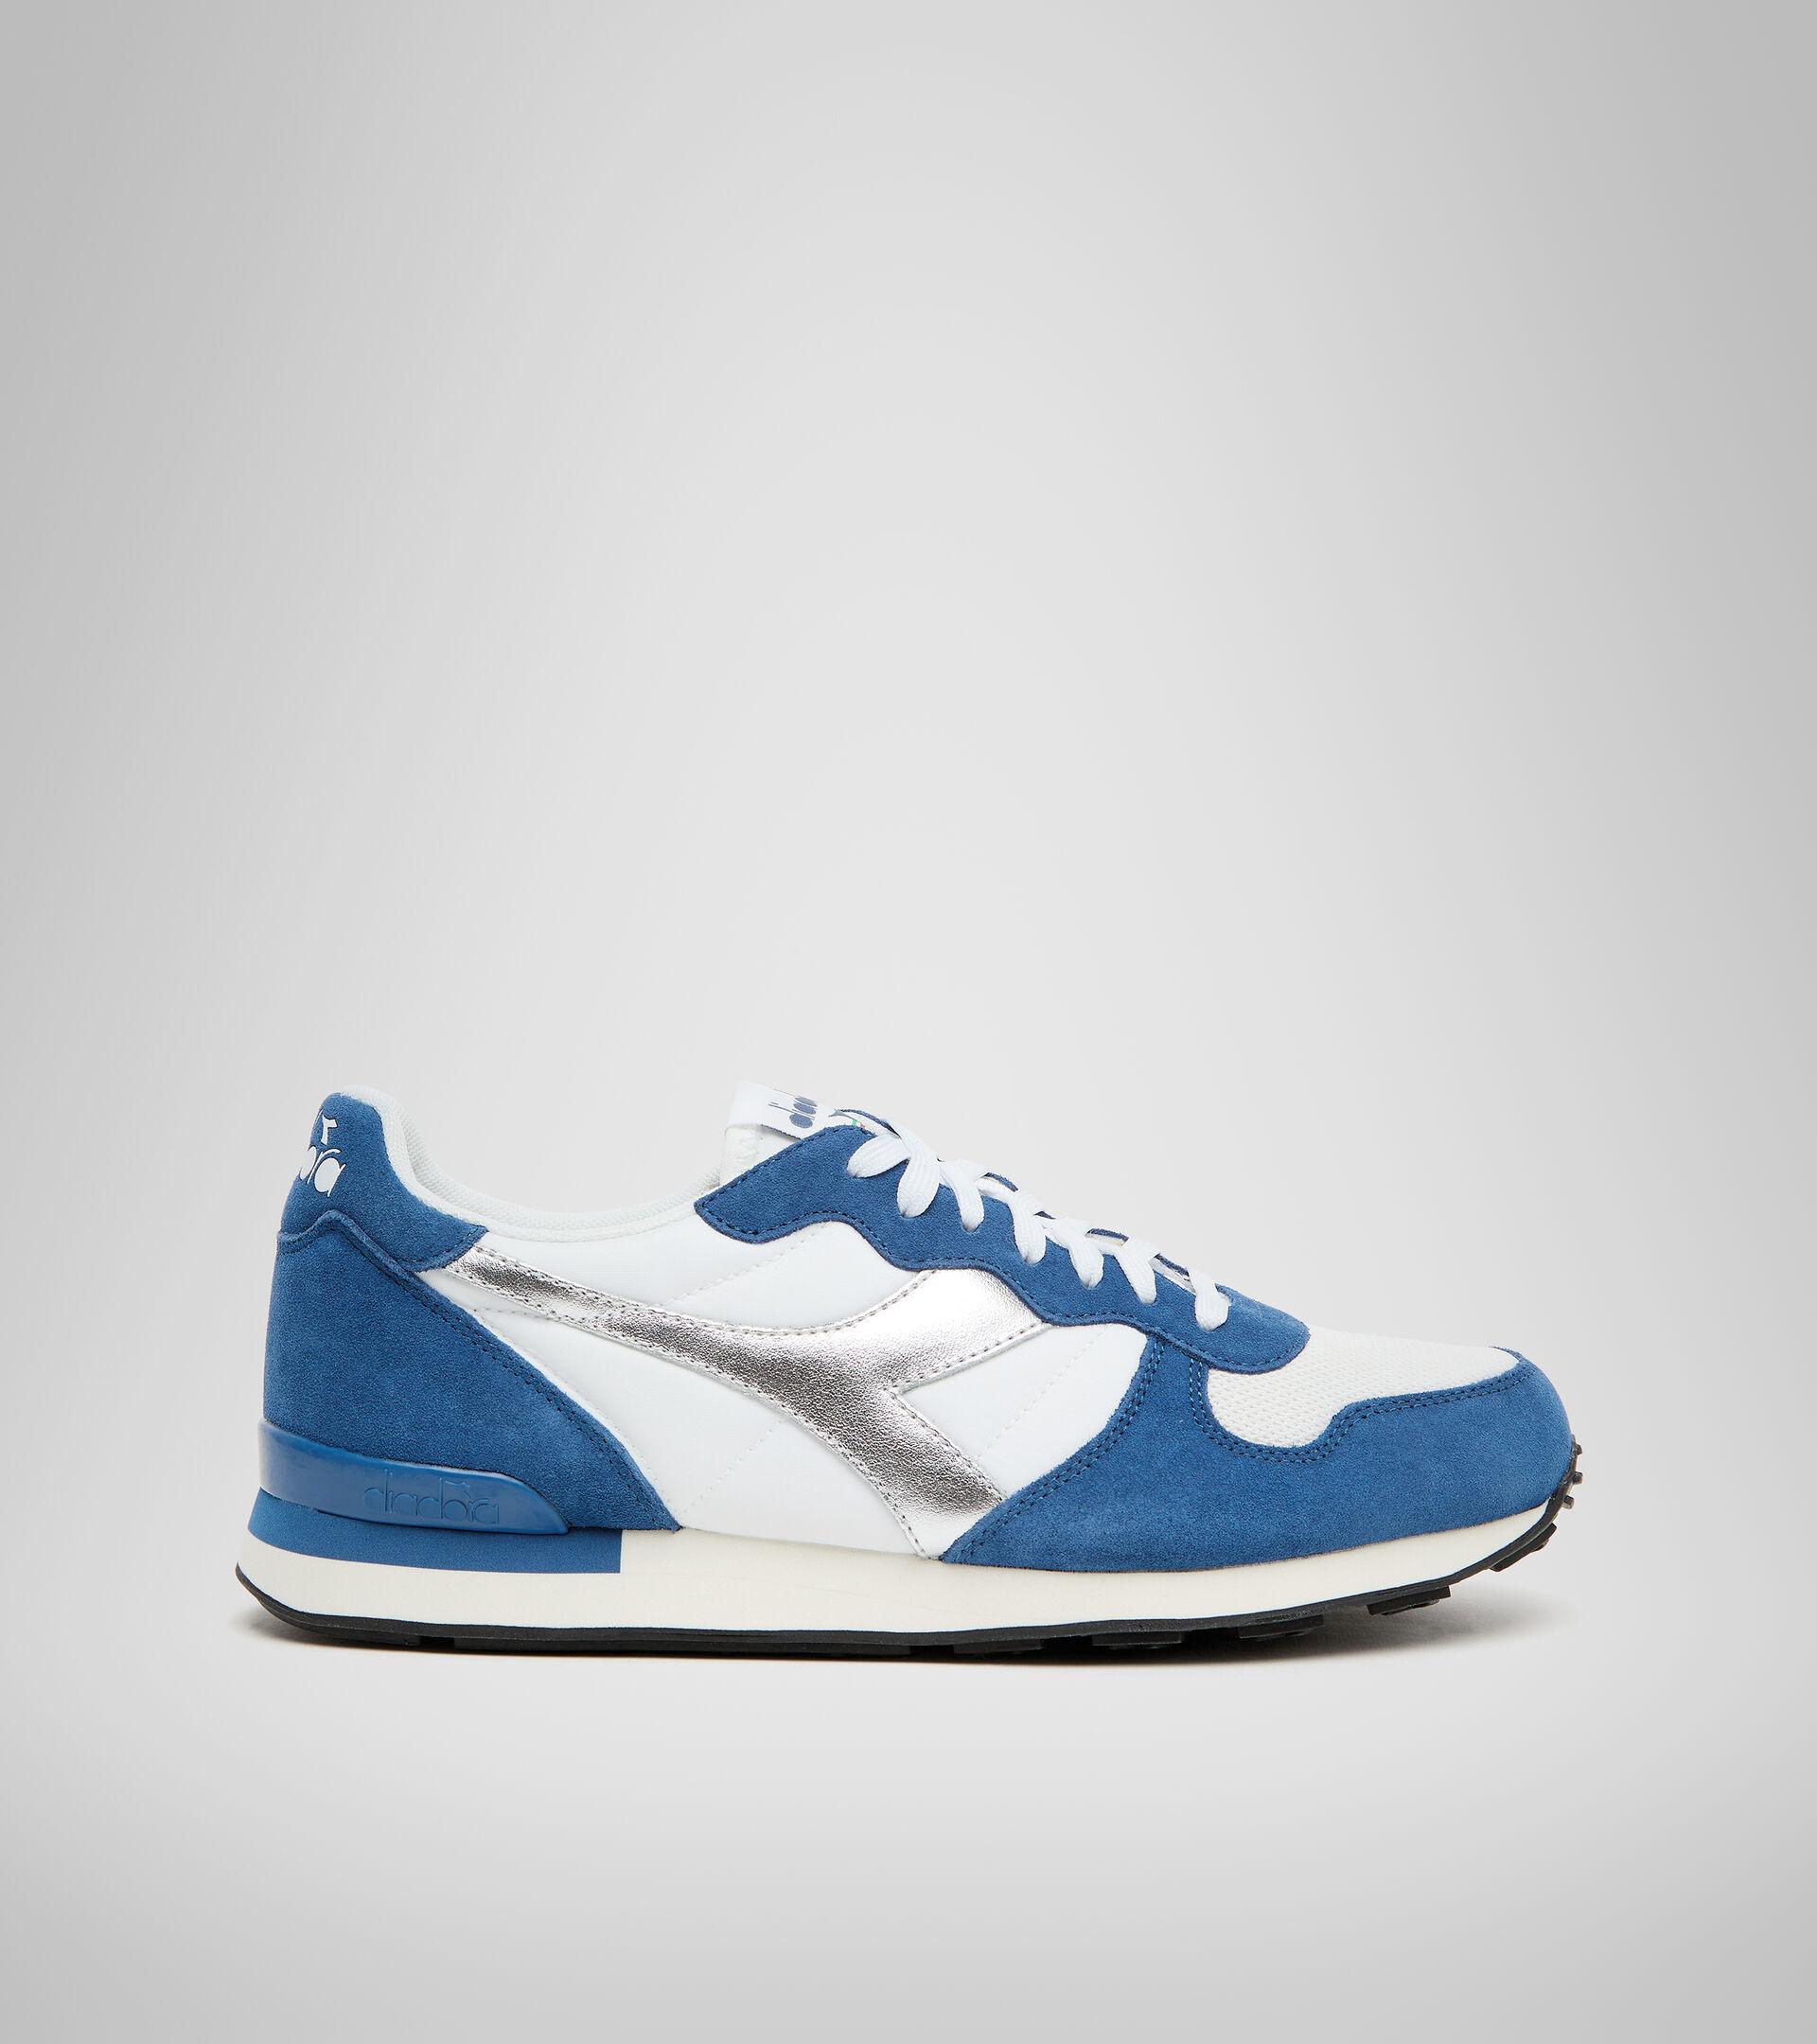 Footwear Sportswear UNISEX CAMARO METAL BIANCO/BLU OLANDESE Diadora